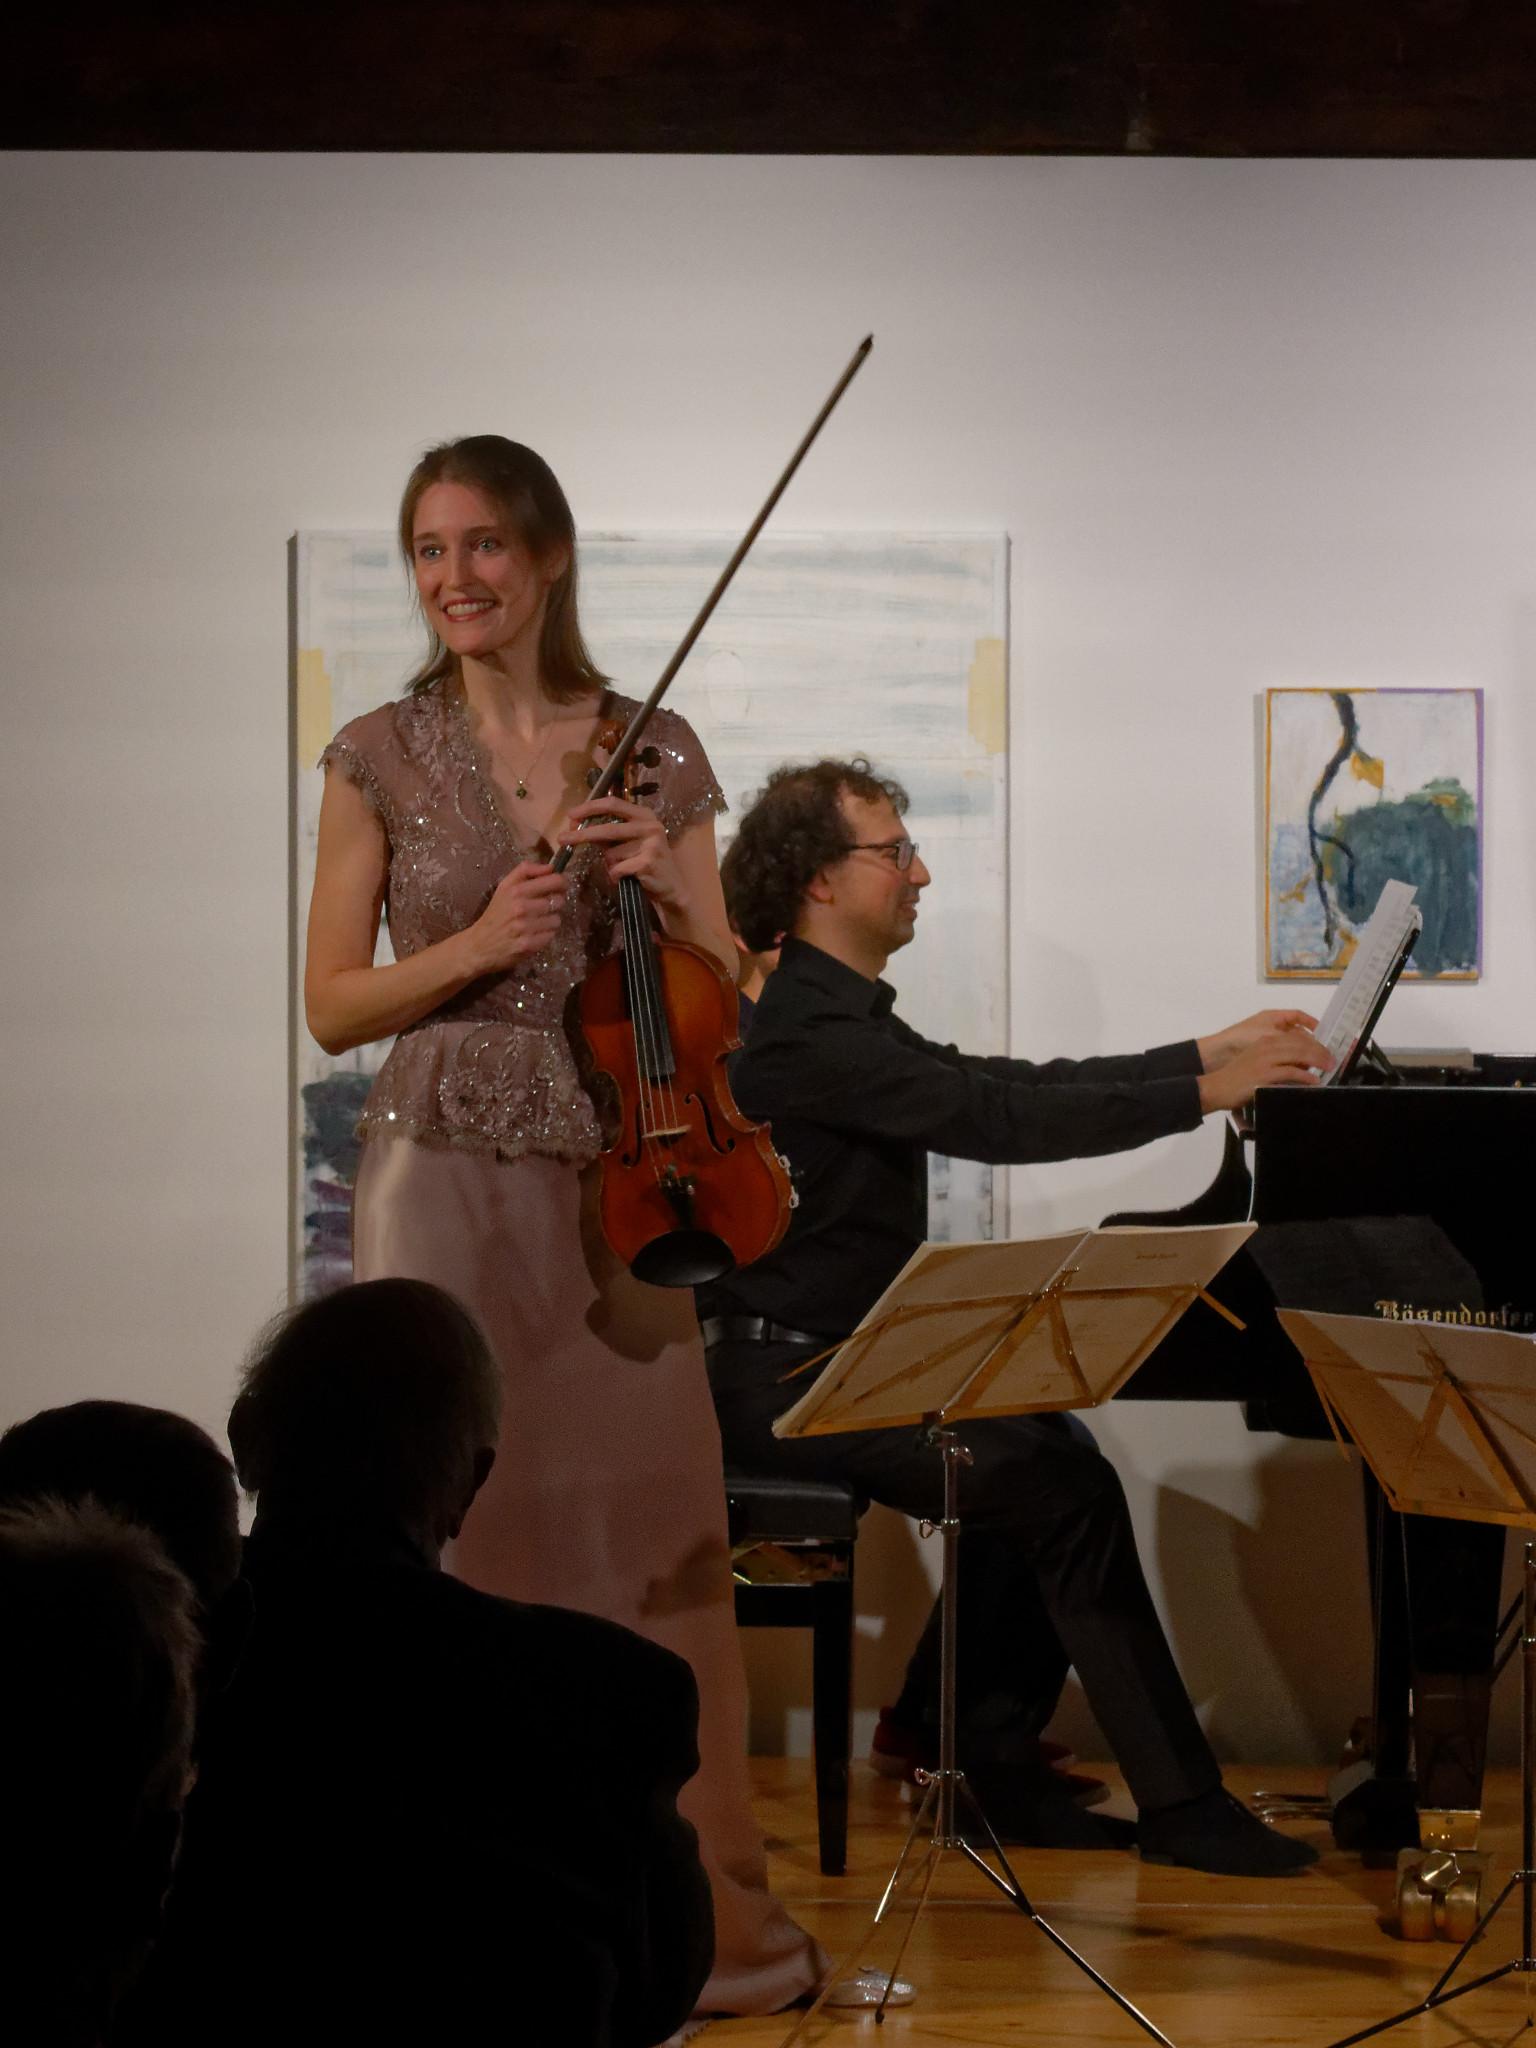 Oberon Trio (Henja Semmler, Jonathan Aner) @ Zimmermannhaus Brugg, 2019-11-02 (© Rolf Kyburz)